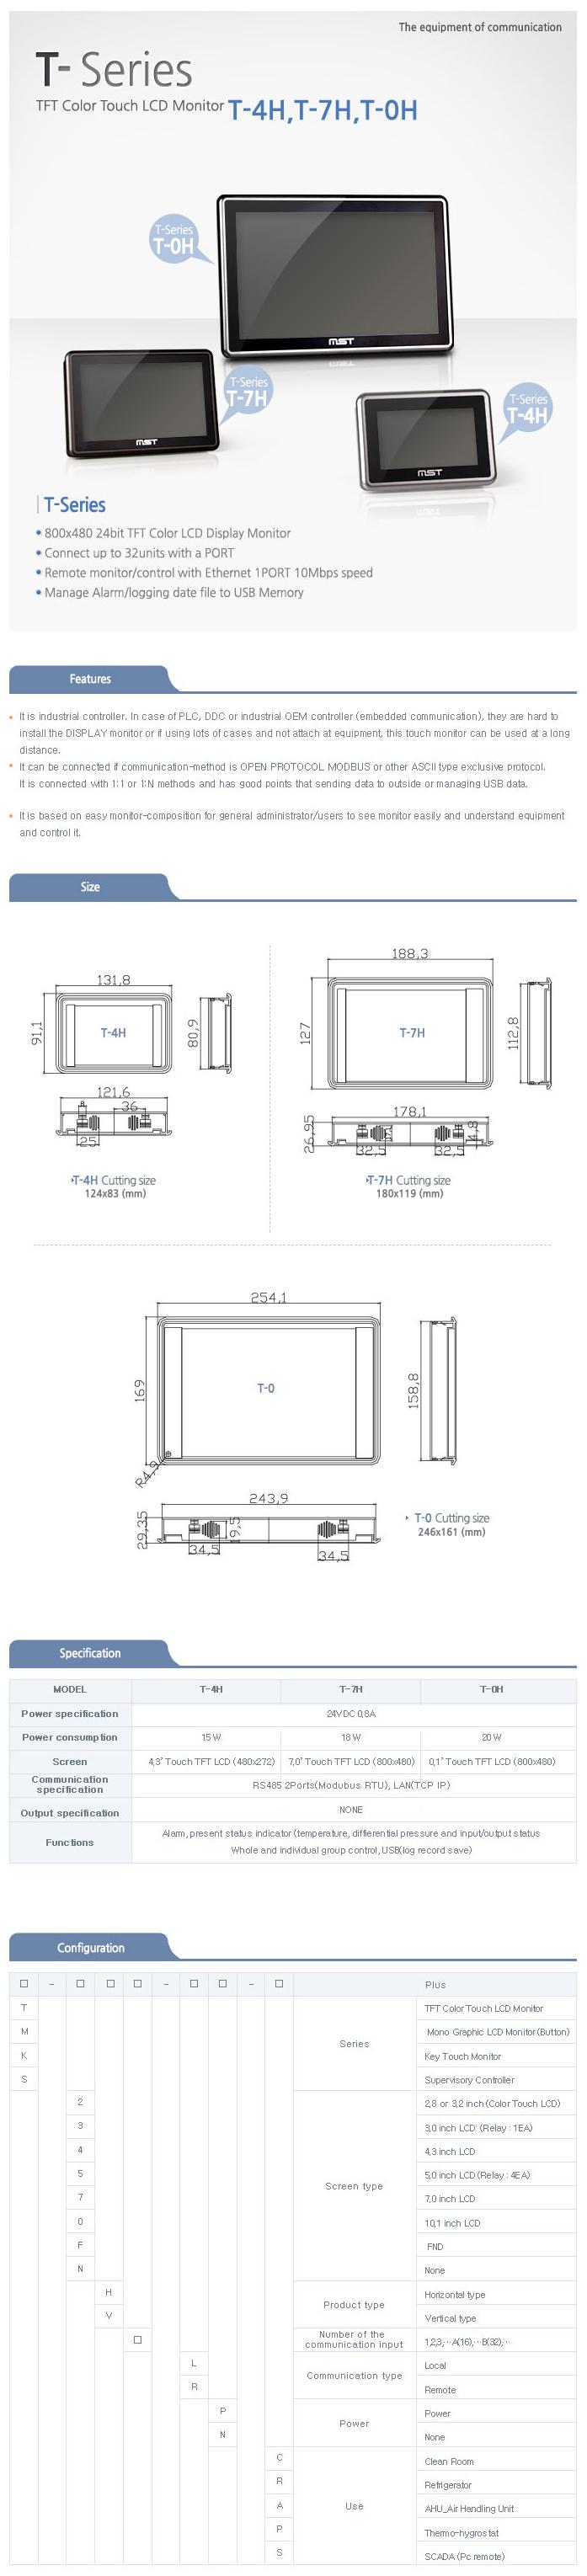 MST TFT Color Touch LCD Monitor (T-4H, T-7H, T-0H) T-Series